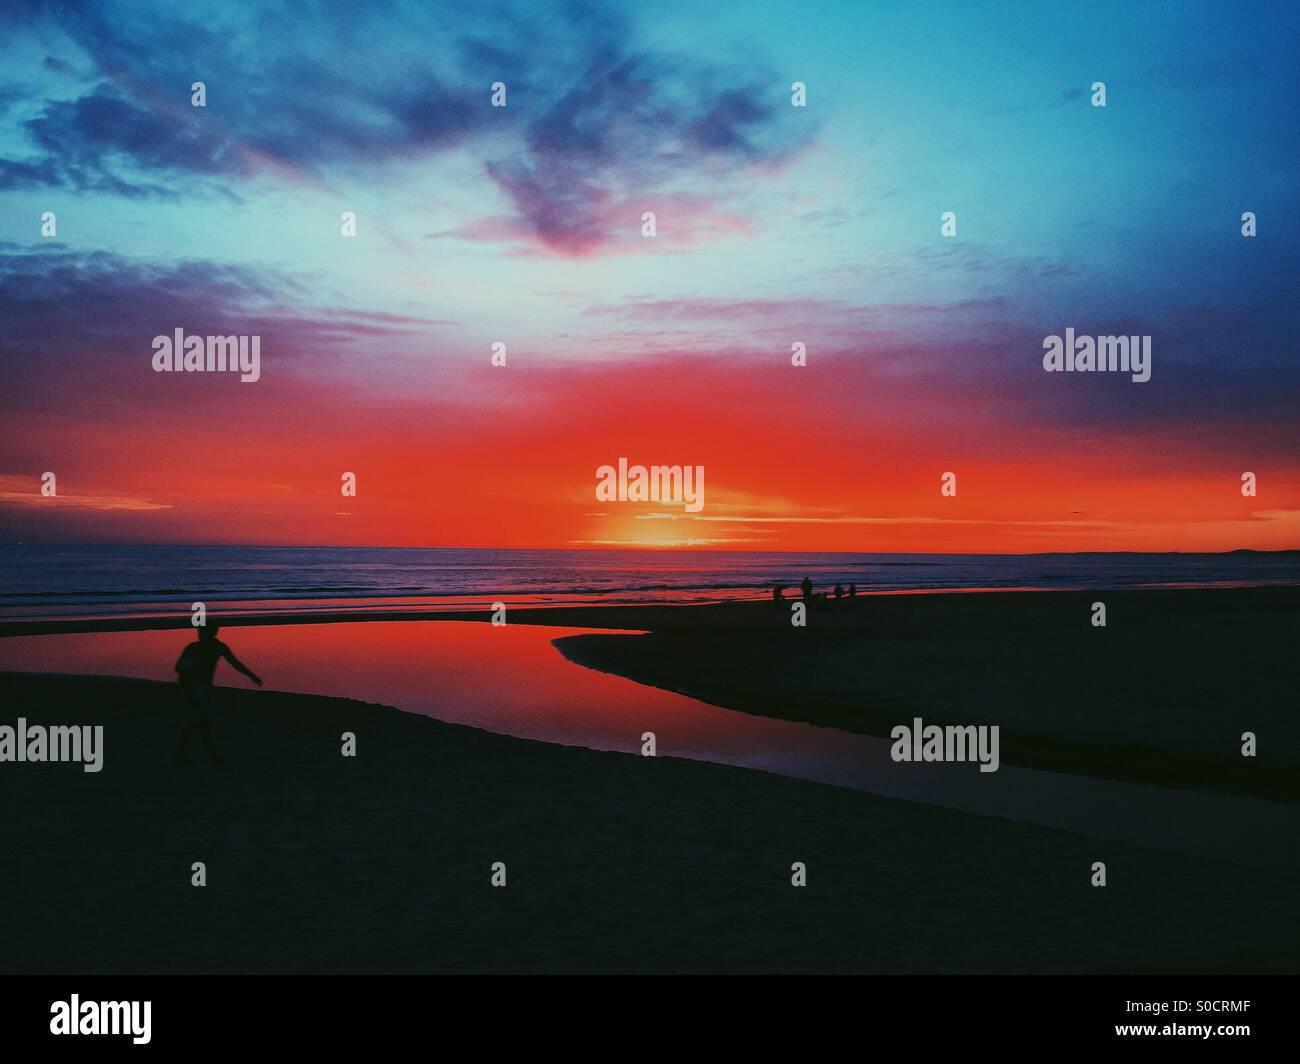 Sunset at Punta del este, Uruguay. - Stock Image